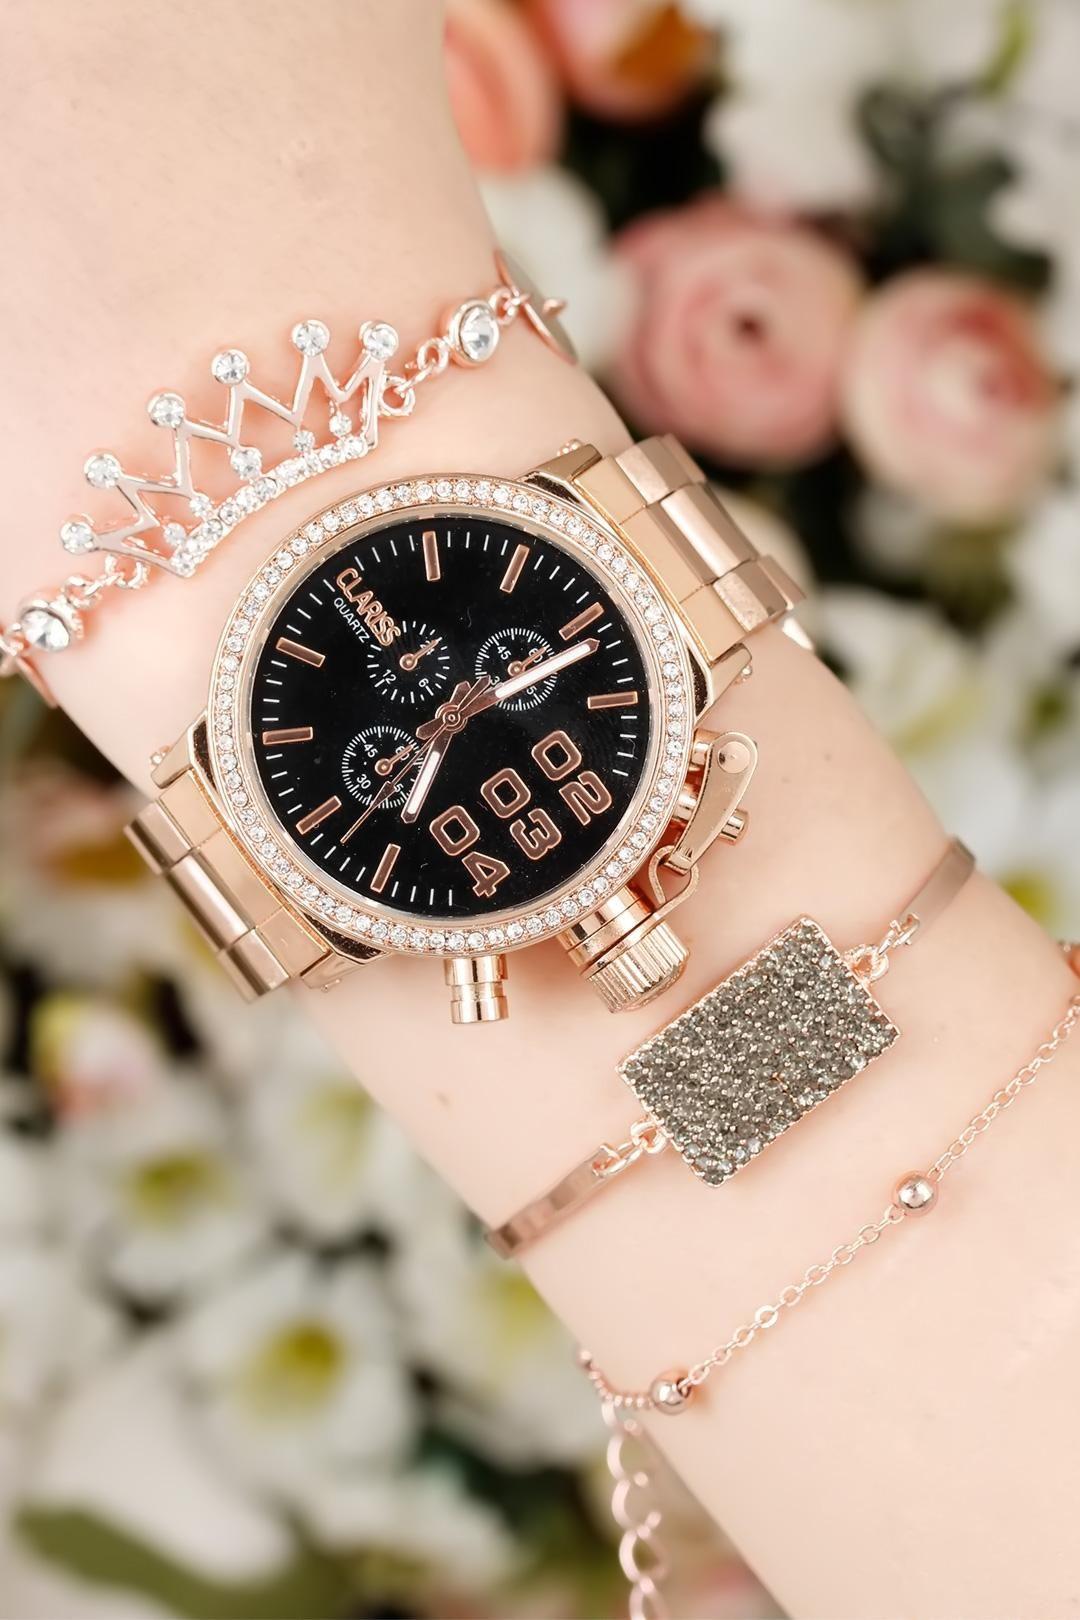 Clariss Marka Rose Renk Kaplama Metal Kordonlu Bayan Saat Ve Tacli Bileklik Kombini Res0 Kadin Saati Bayan Saatleri Bileklik